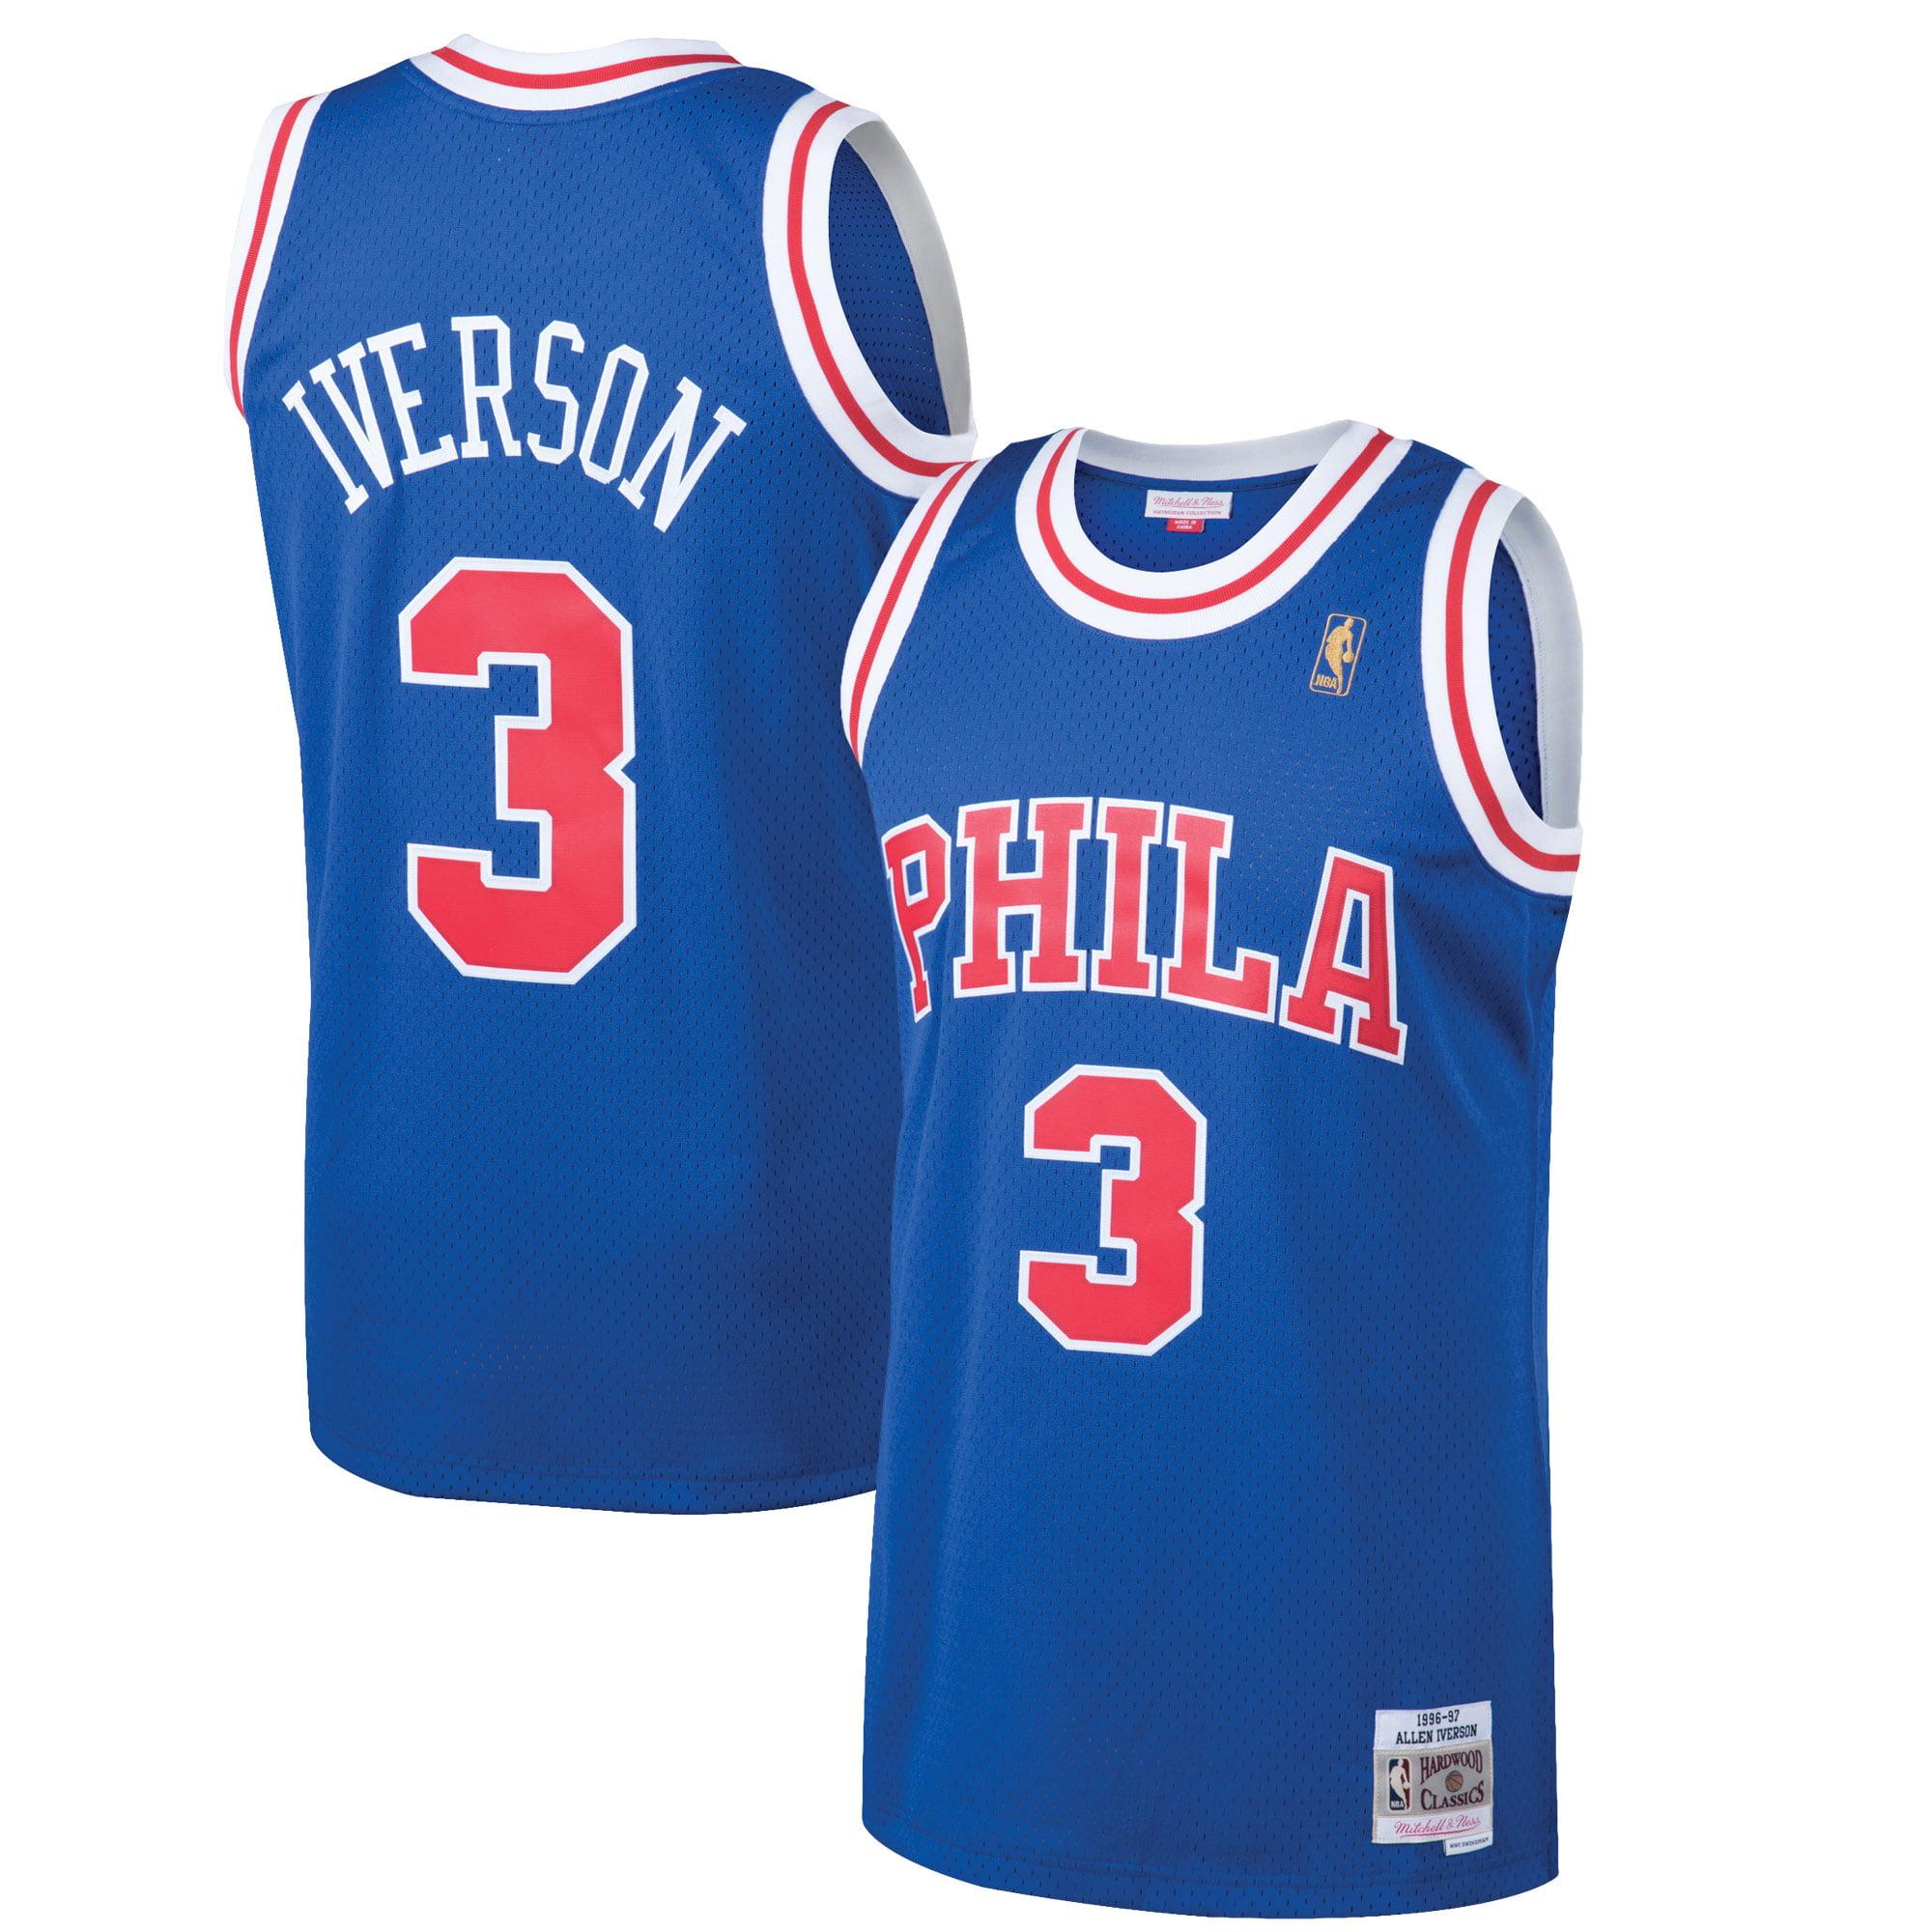 Allen Iverson Philadelphia 76ers Mitchell & Ness 1996-97 Hardwood Classics Swingman Jersey - Royal